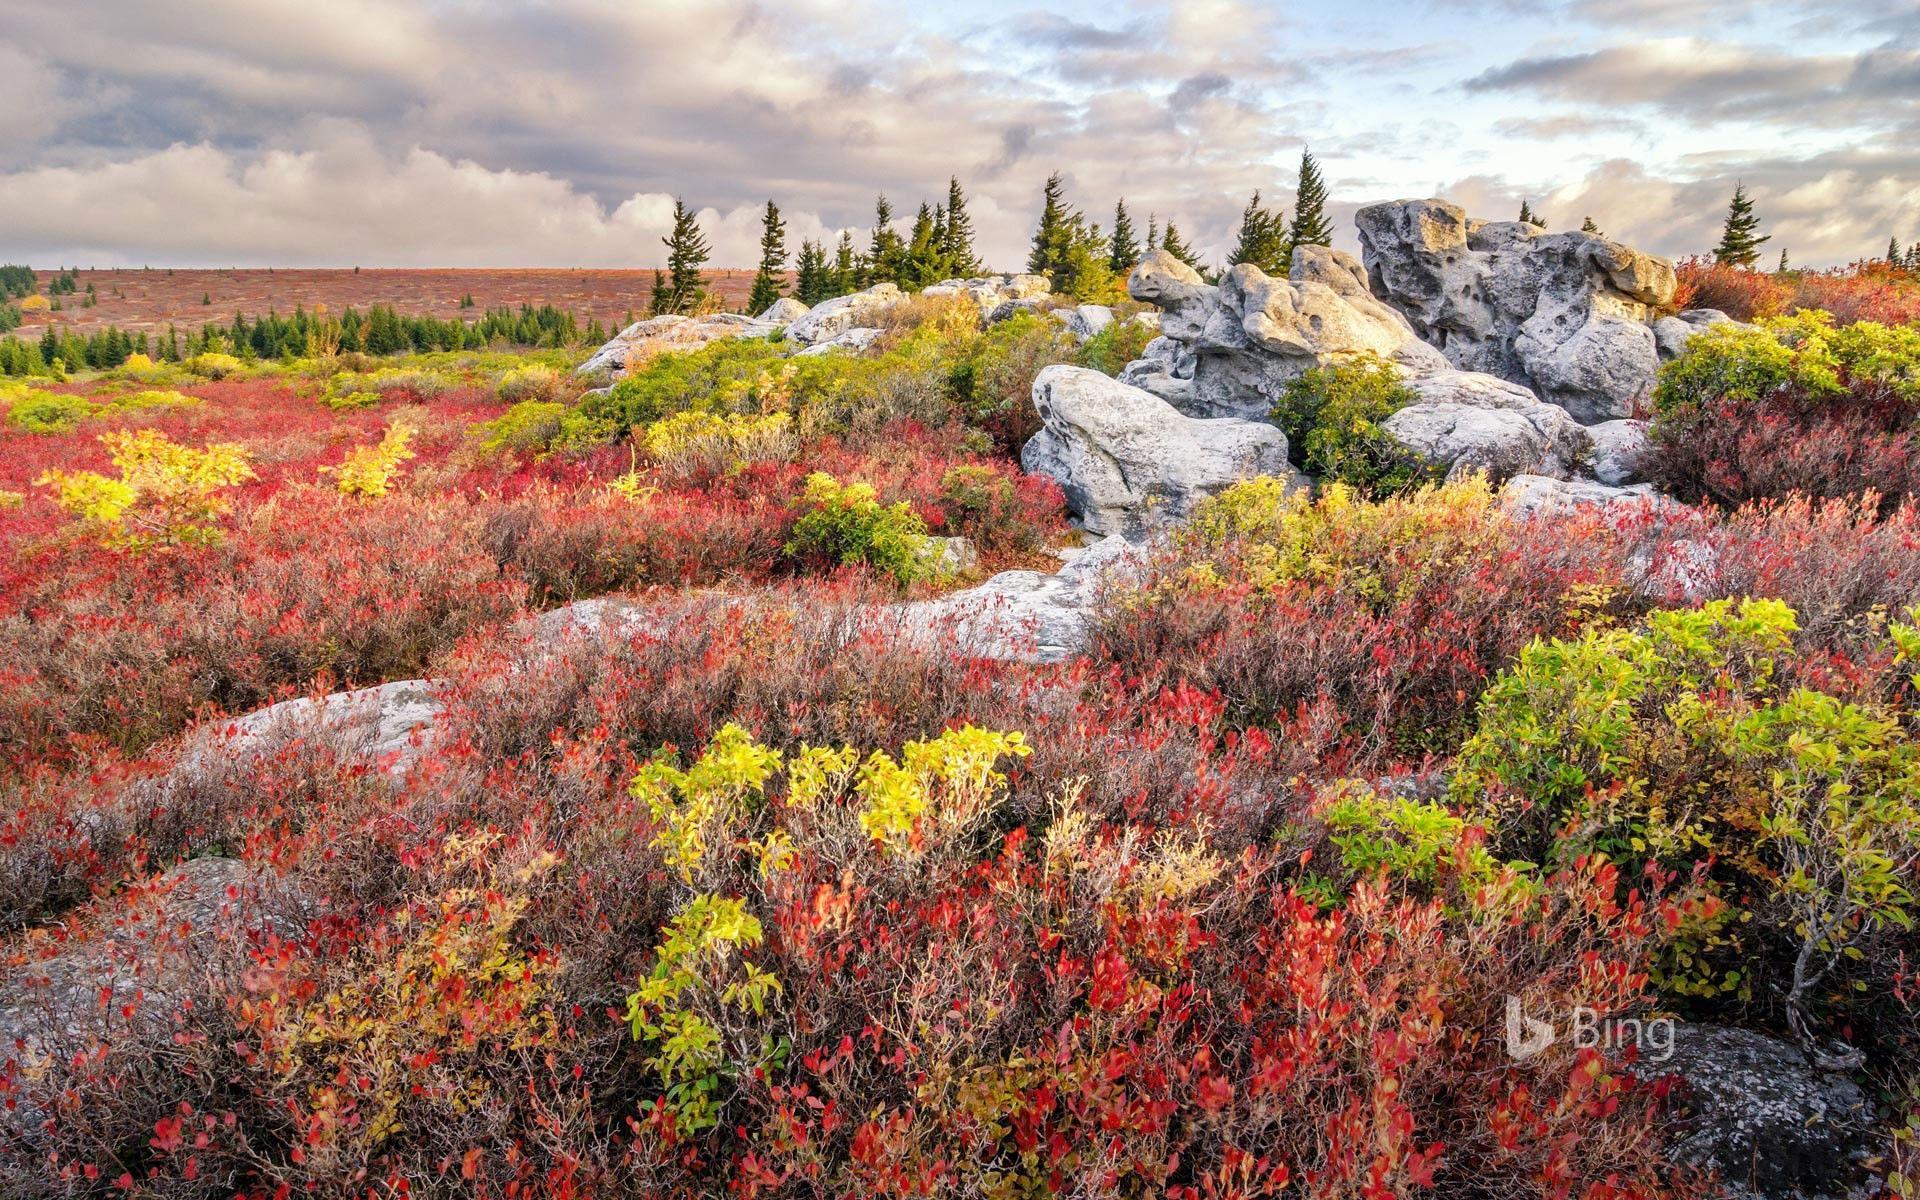 Bear Rocks Preserve in the Dolly Sods Wilderness, West